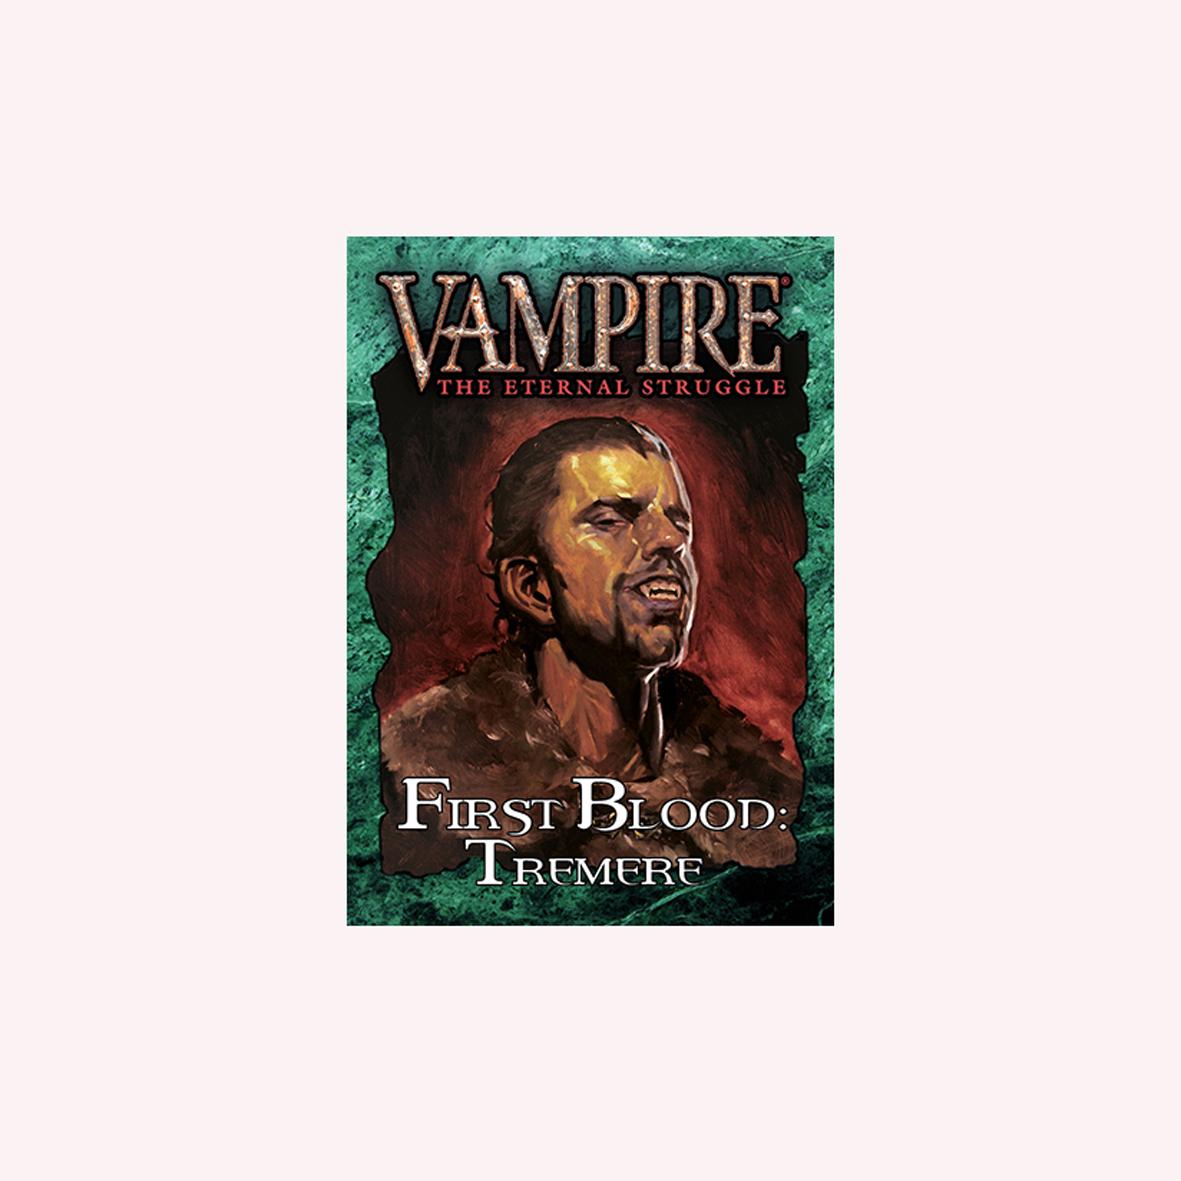 VAMPIRE THE ETERNAL STRUGGLE - PRIMEIRO SANGUE TREMERE